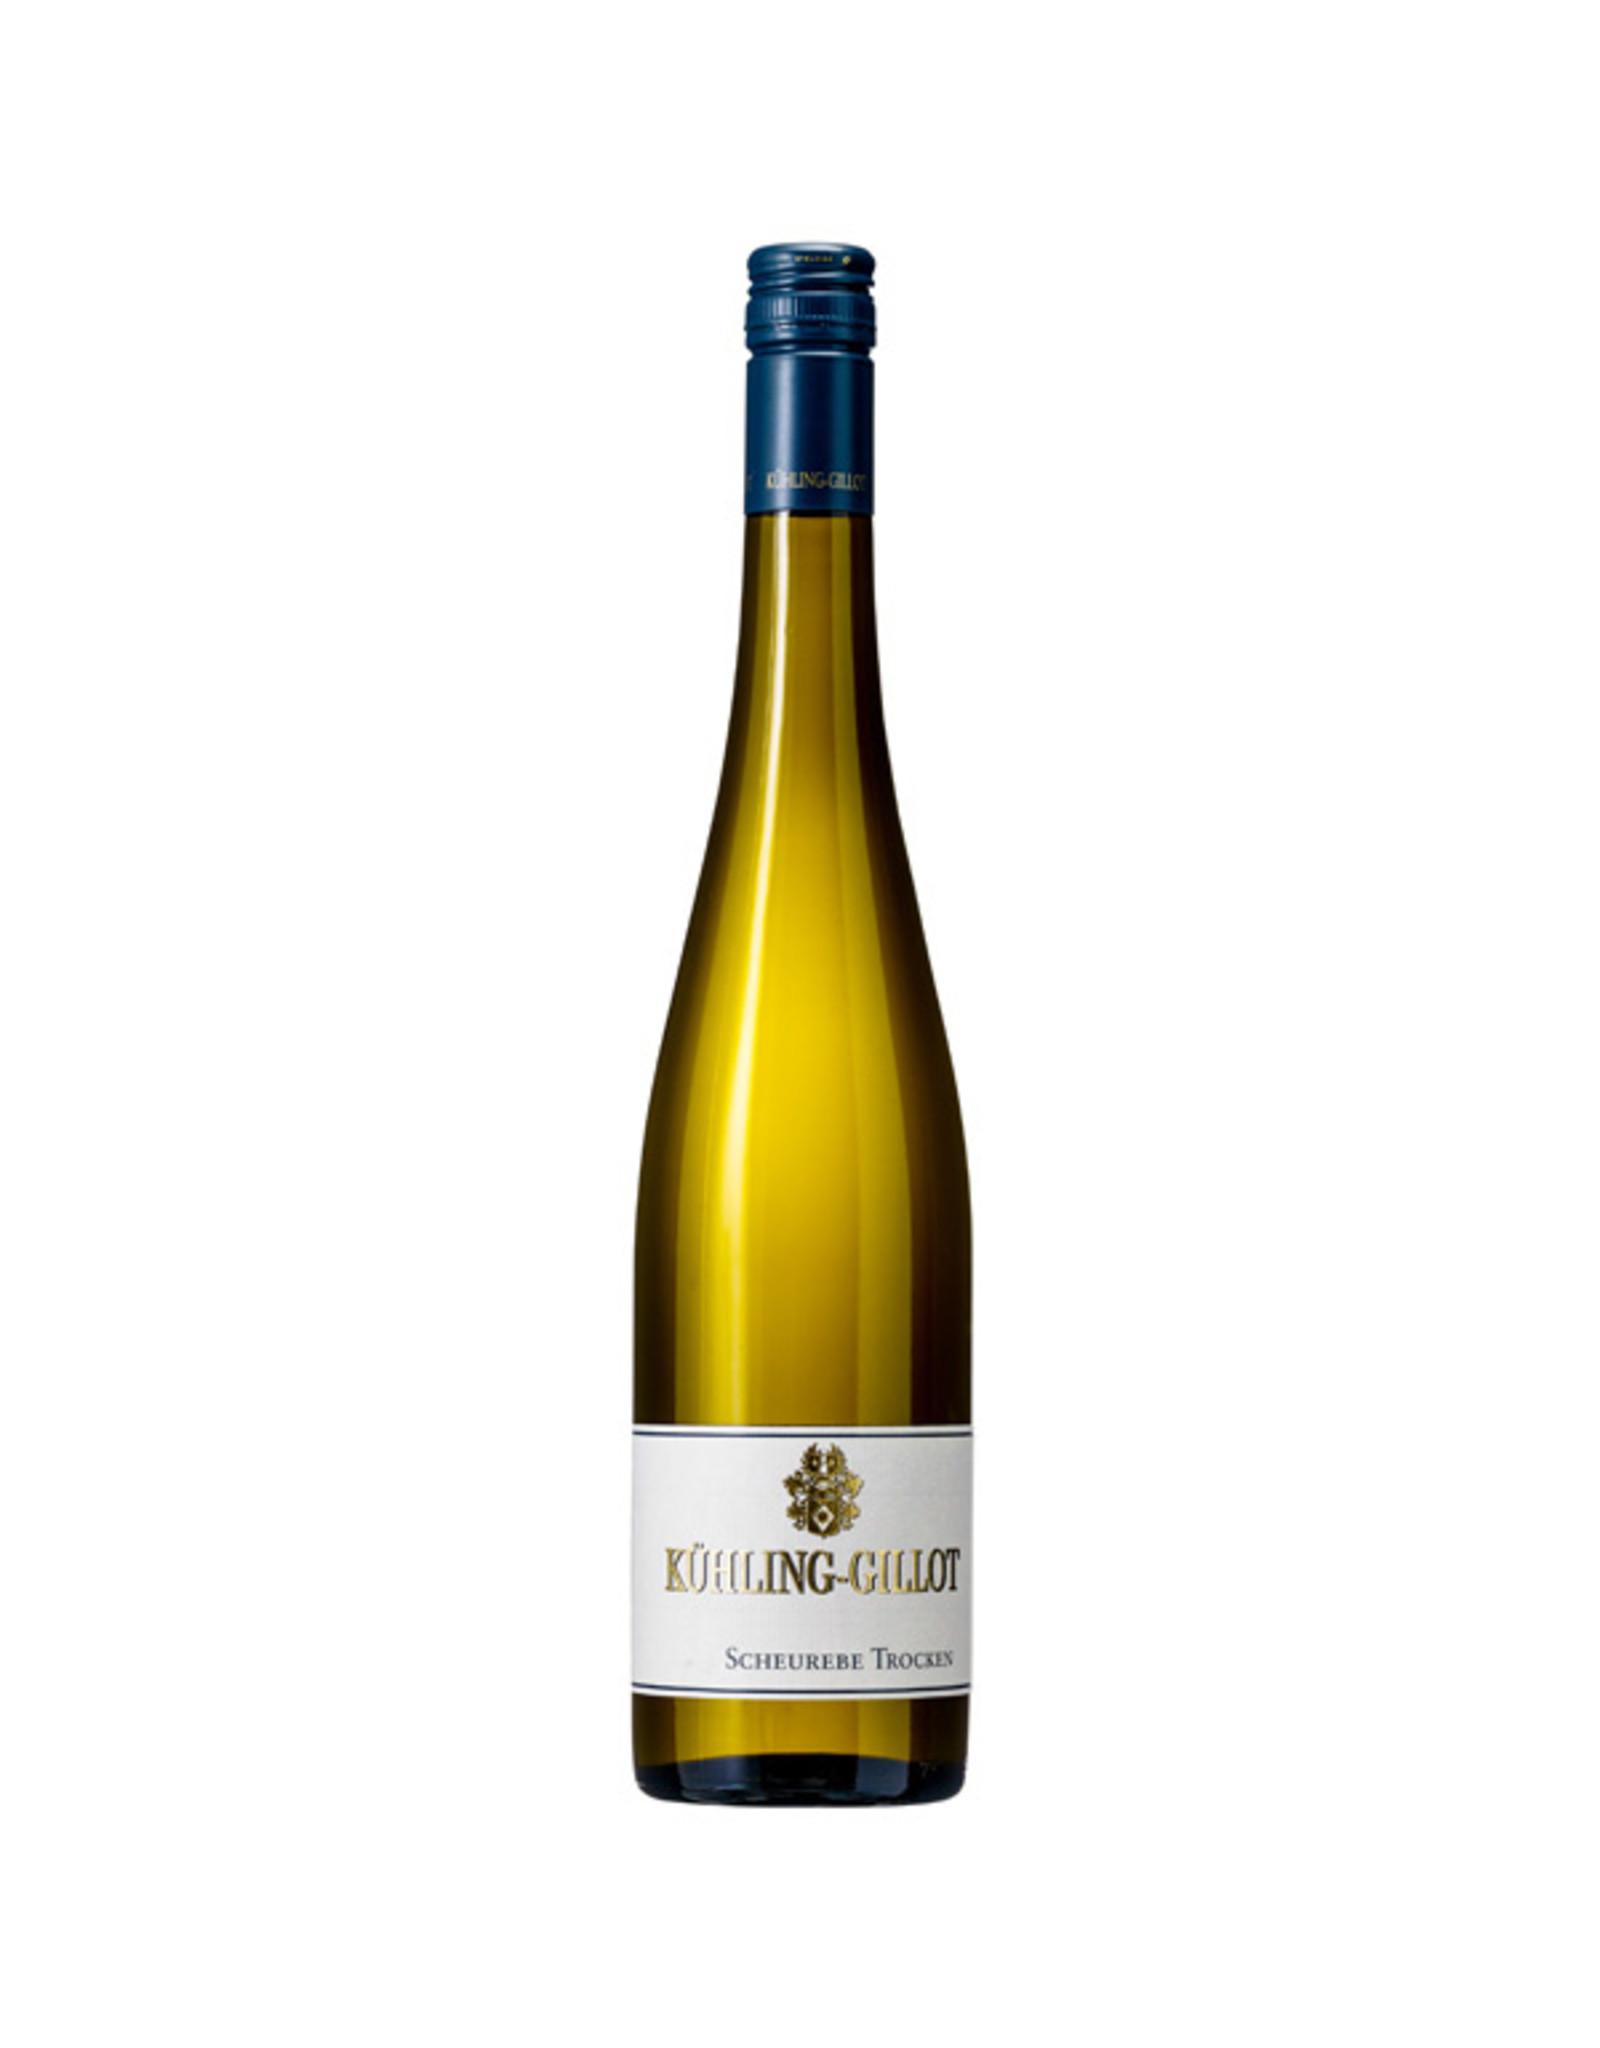 Weingut Kühling-Gillot, Bodenheim Kuhling Gillot Scheurebe 2017